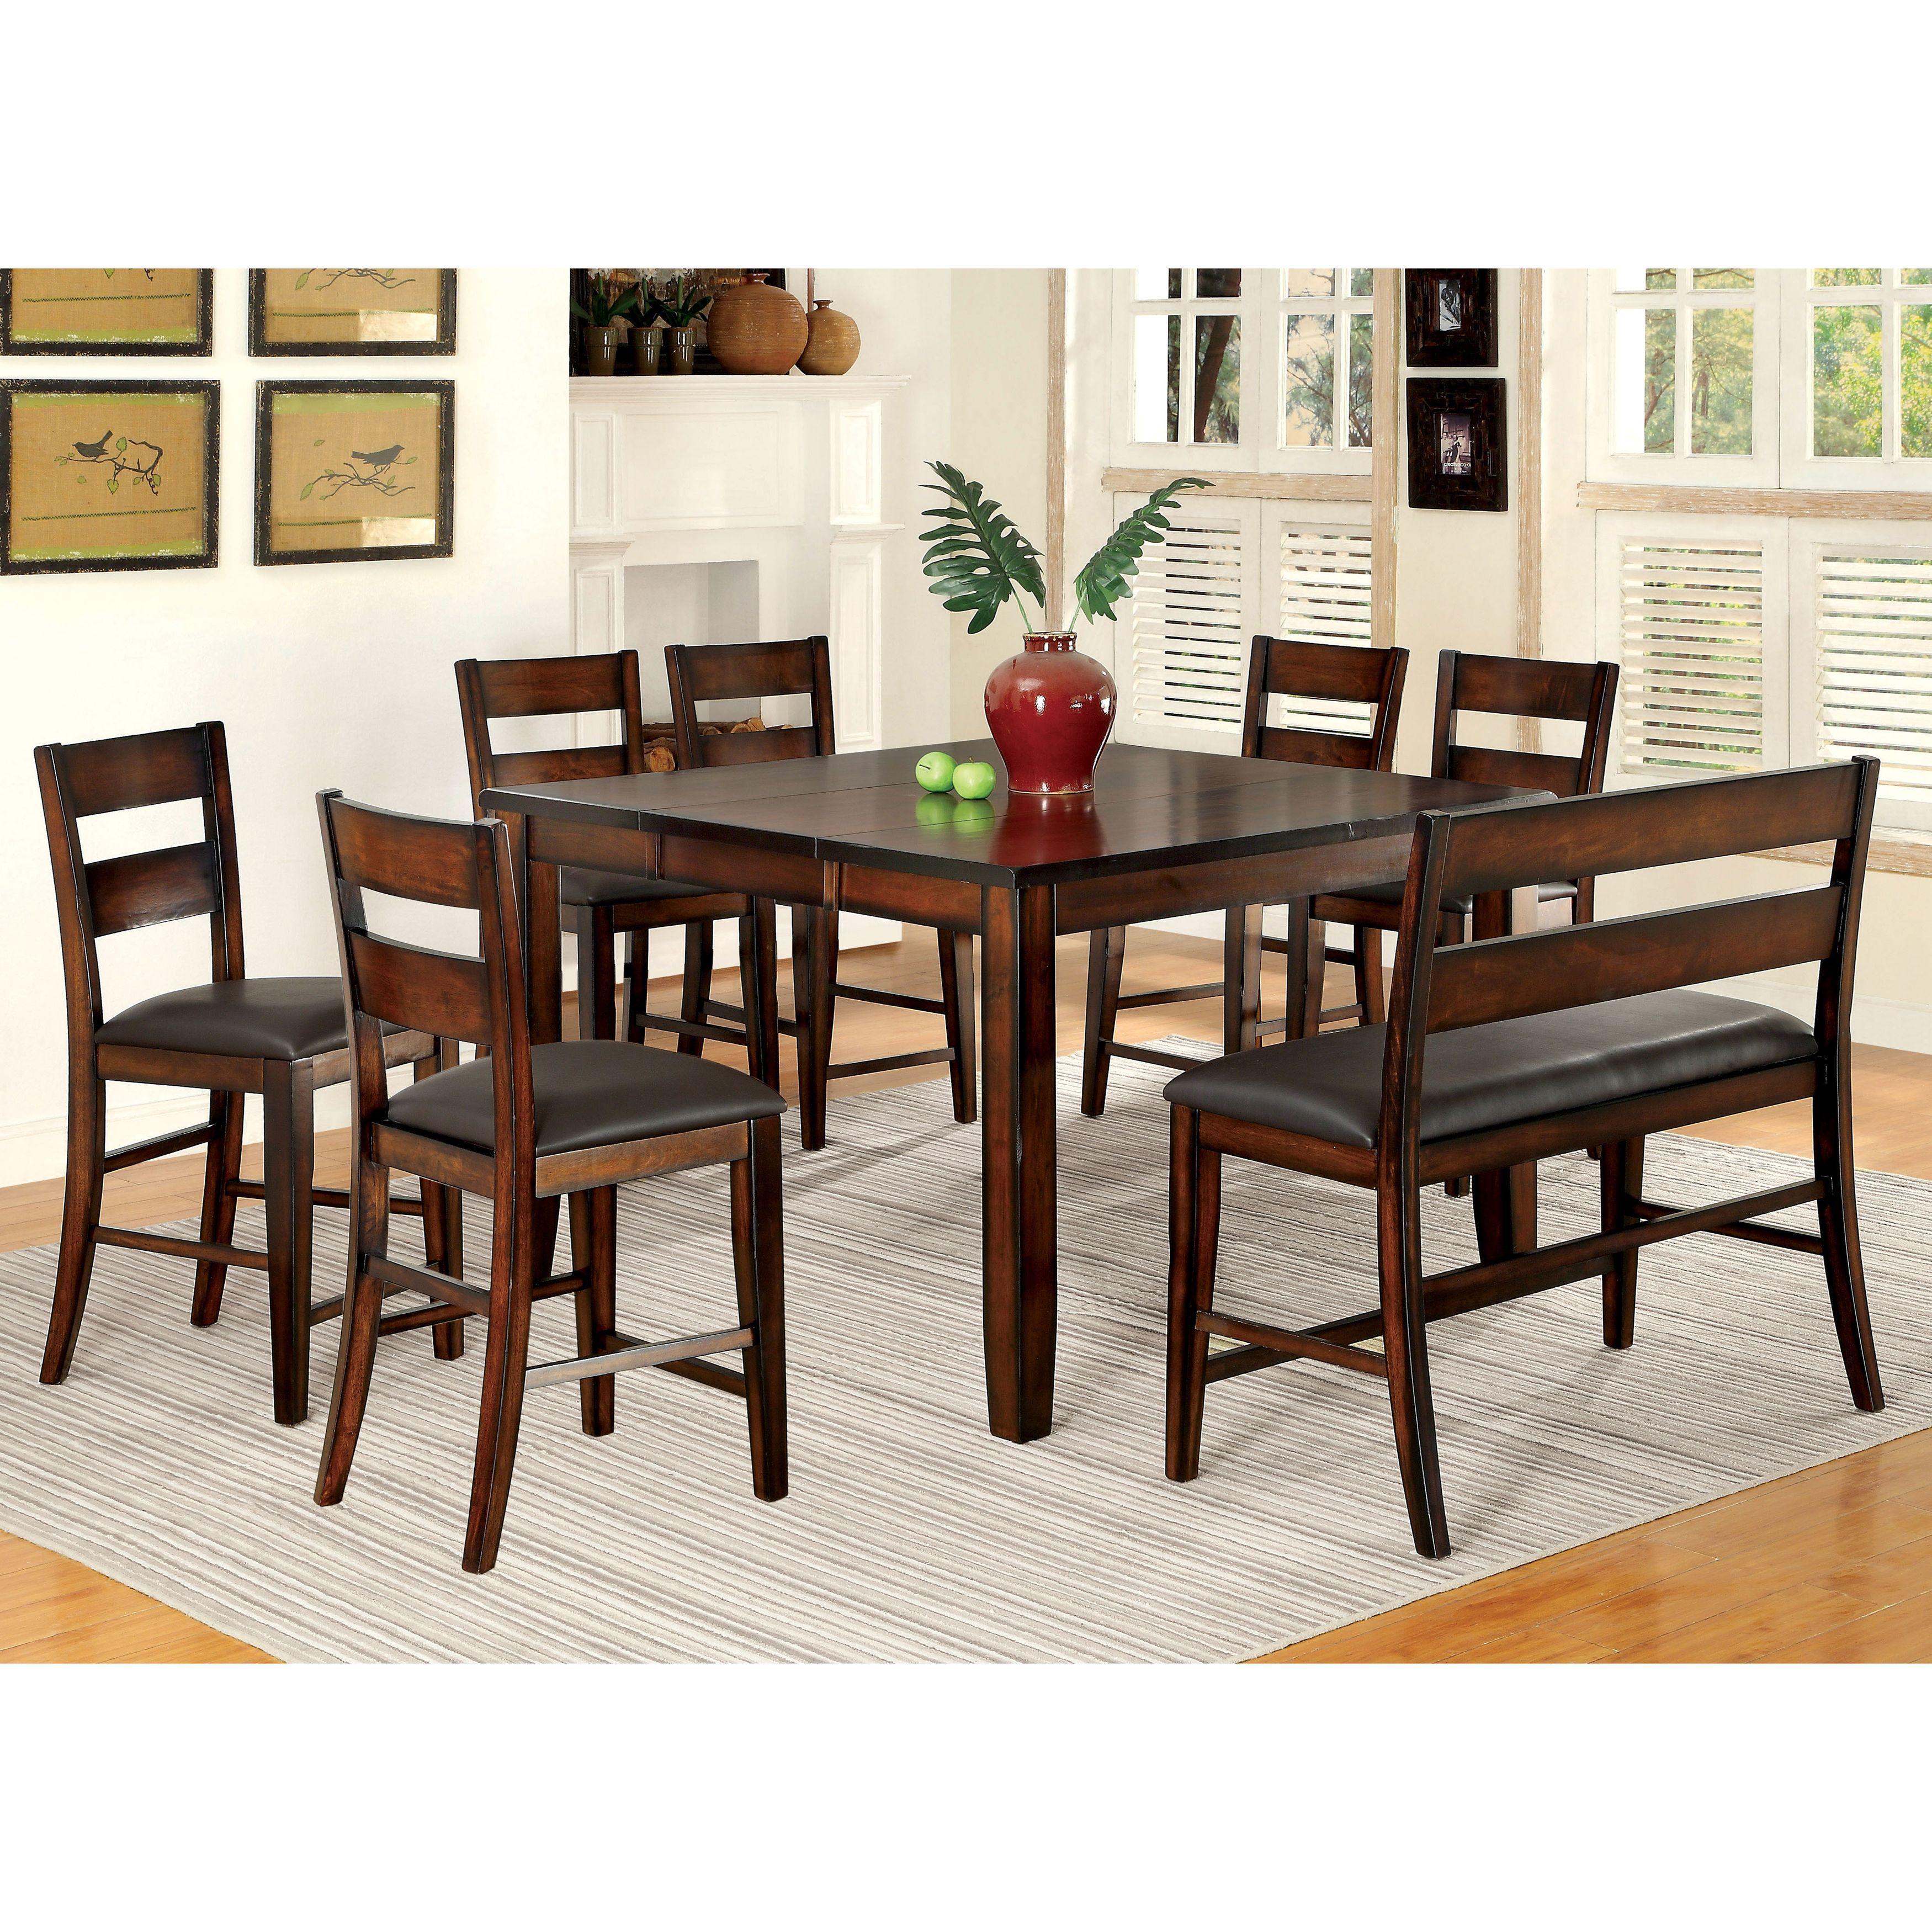 Furniture Of America Katrine Dark Cherry 8 Piece Counter Height Dining Set